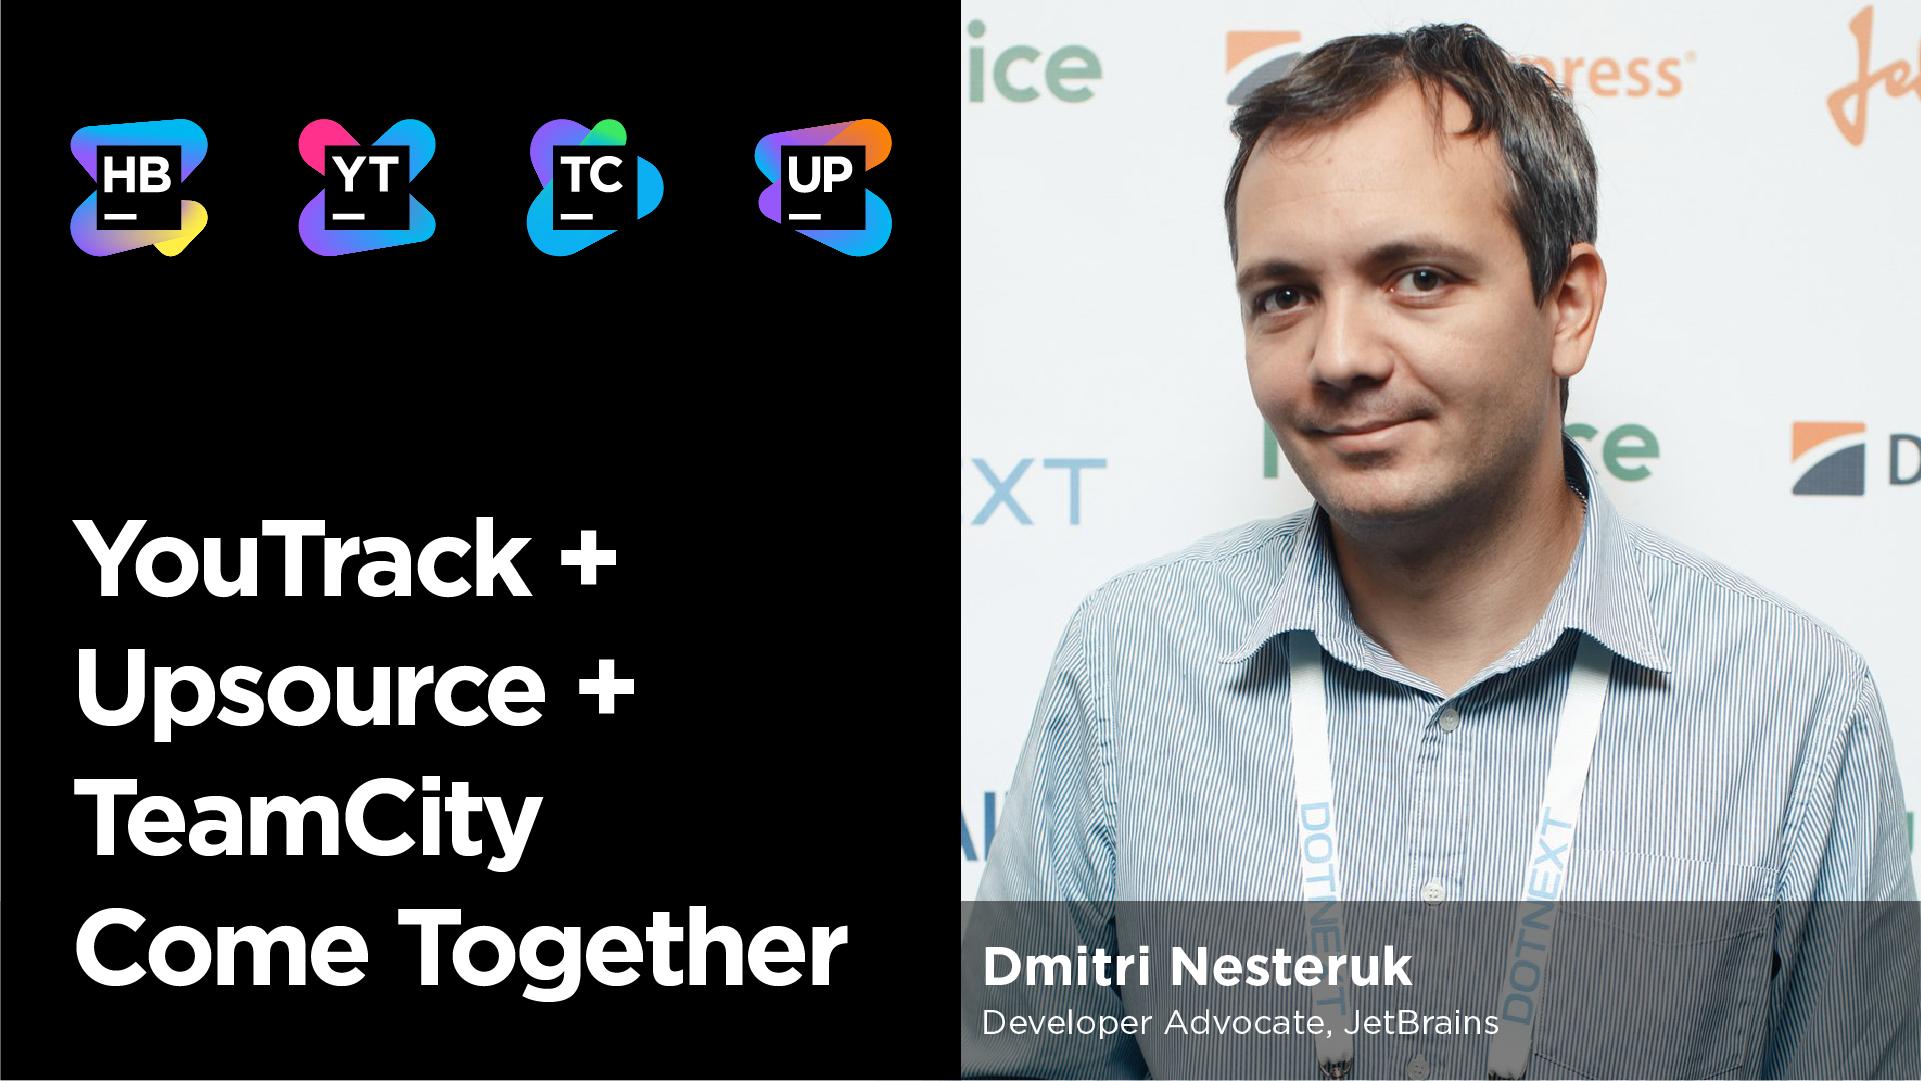 hub_webinar_YouTrack+Upsource+TeamCity_Come_Together_2